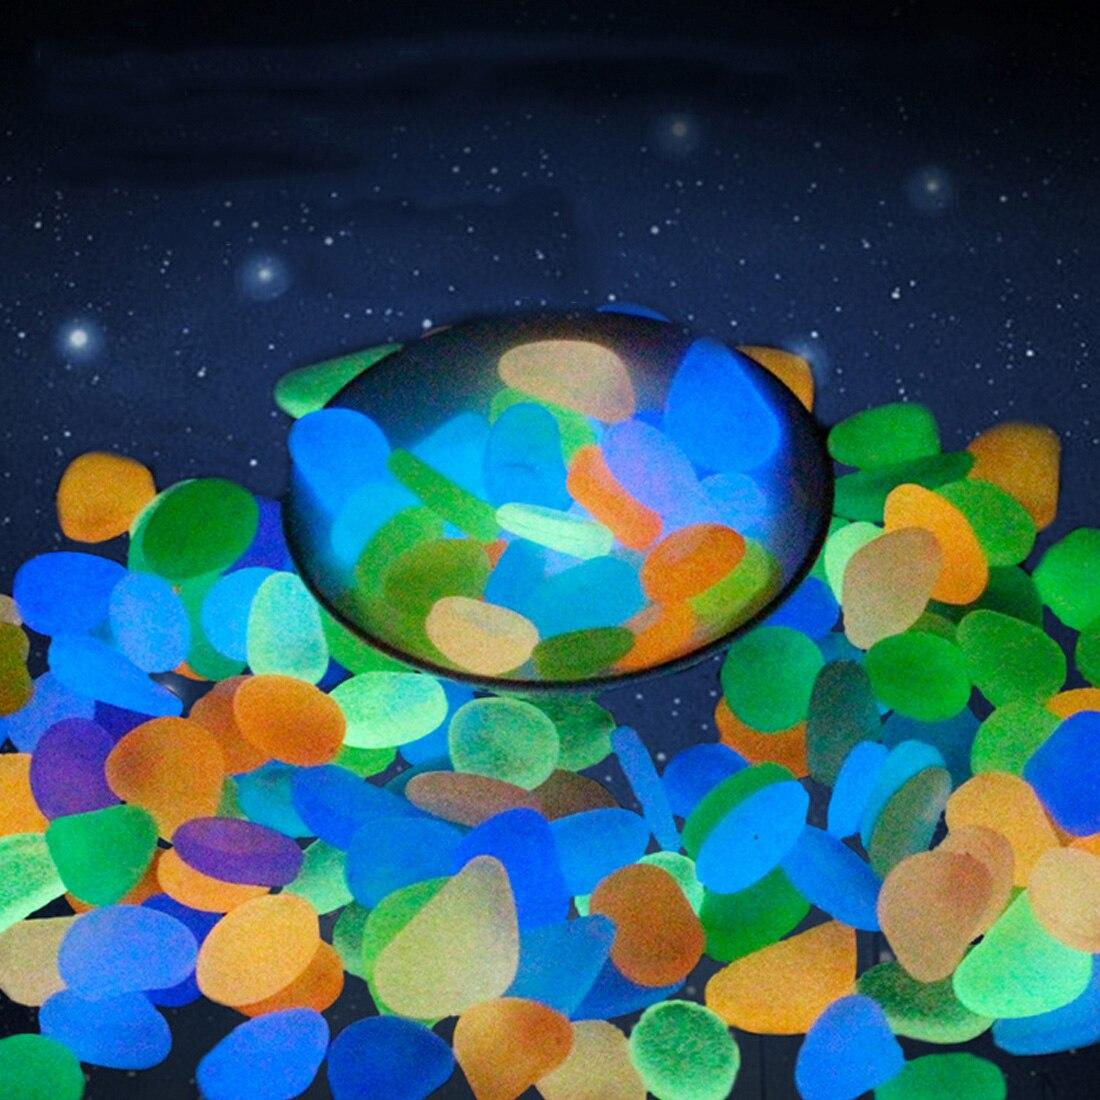 10Pcs Glow In The Dark Garden Pebbles Glow Stones Rocks For Walkways Garden Path Patio Lawn Garden Yard Decor Luminous Stones